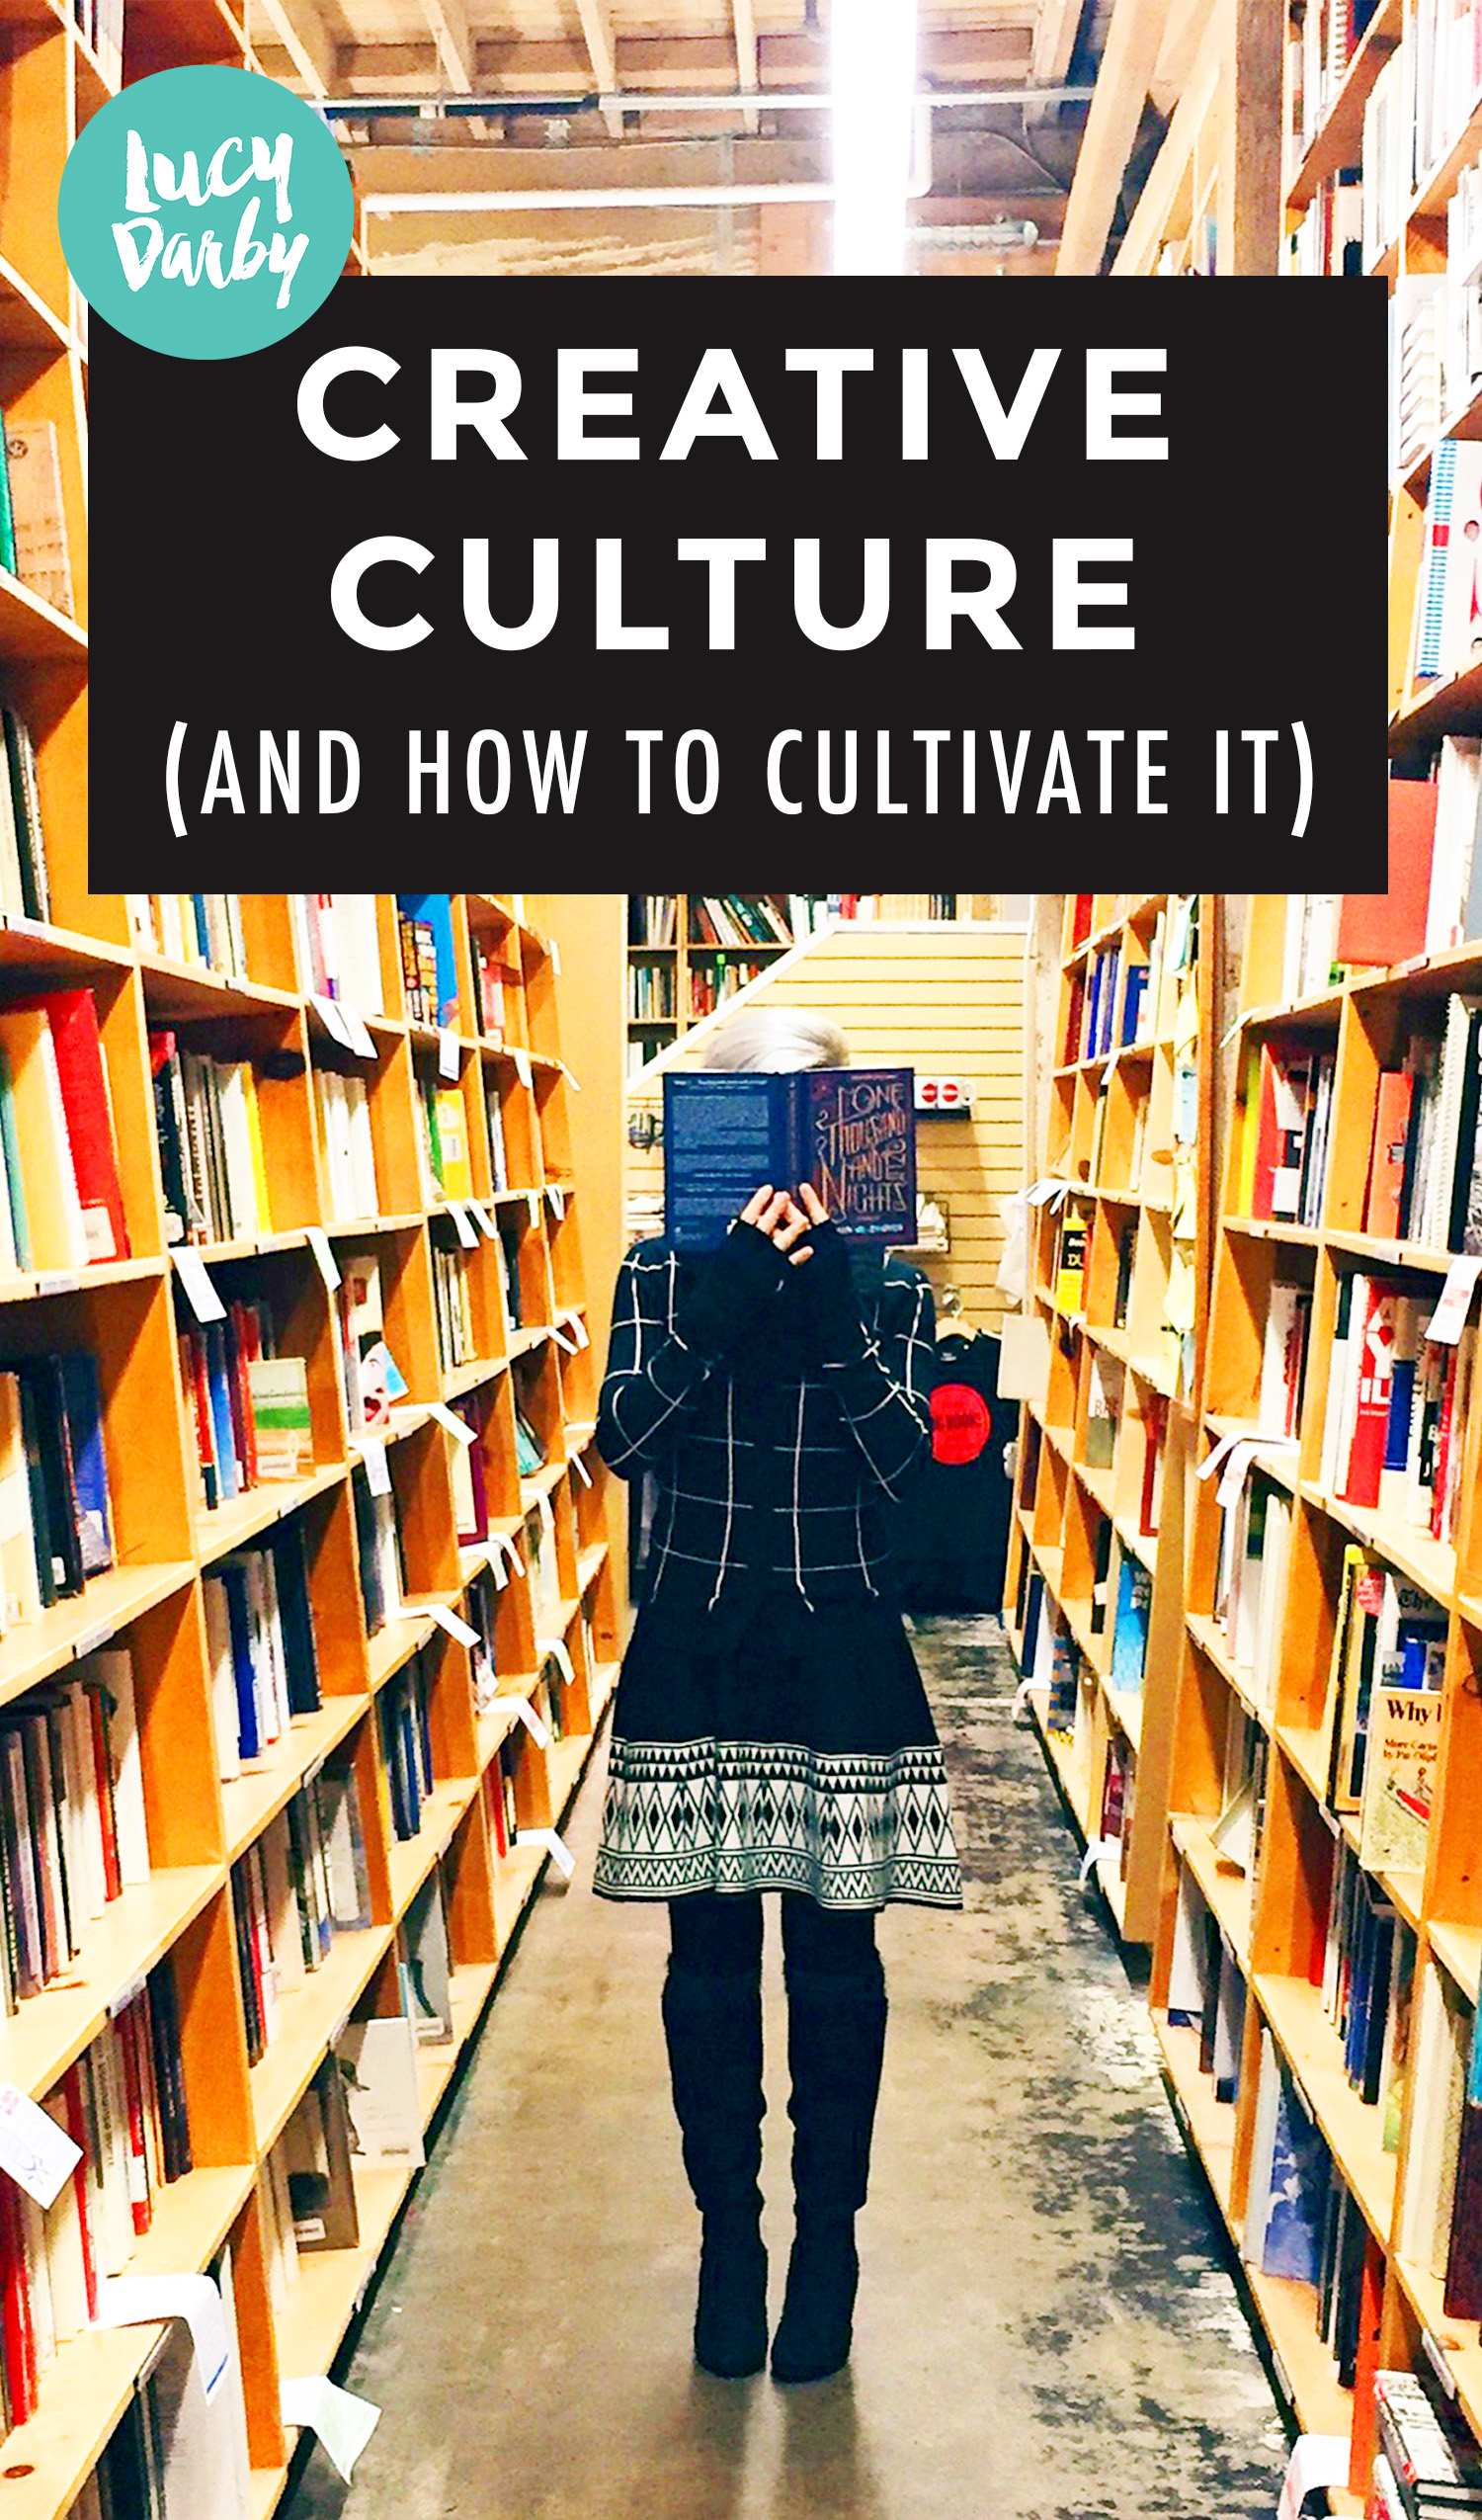 How To Cultivate Creative Culture